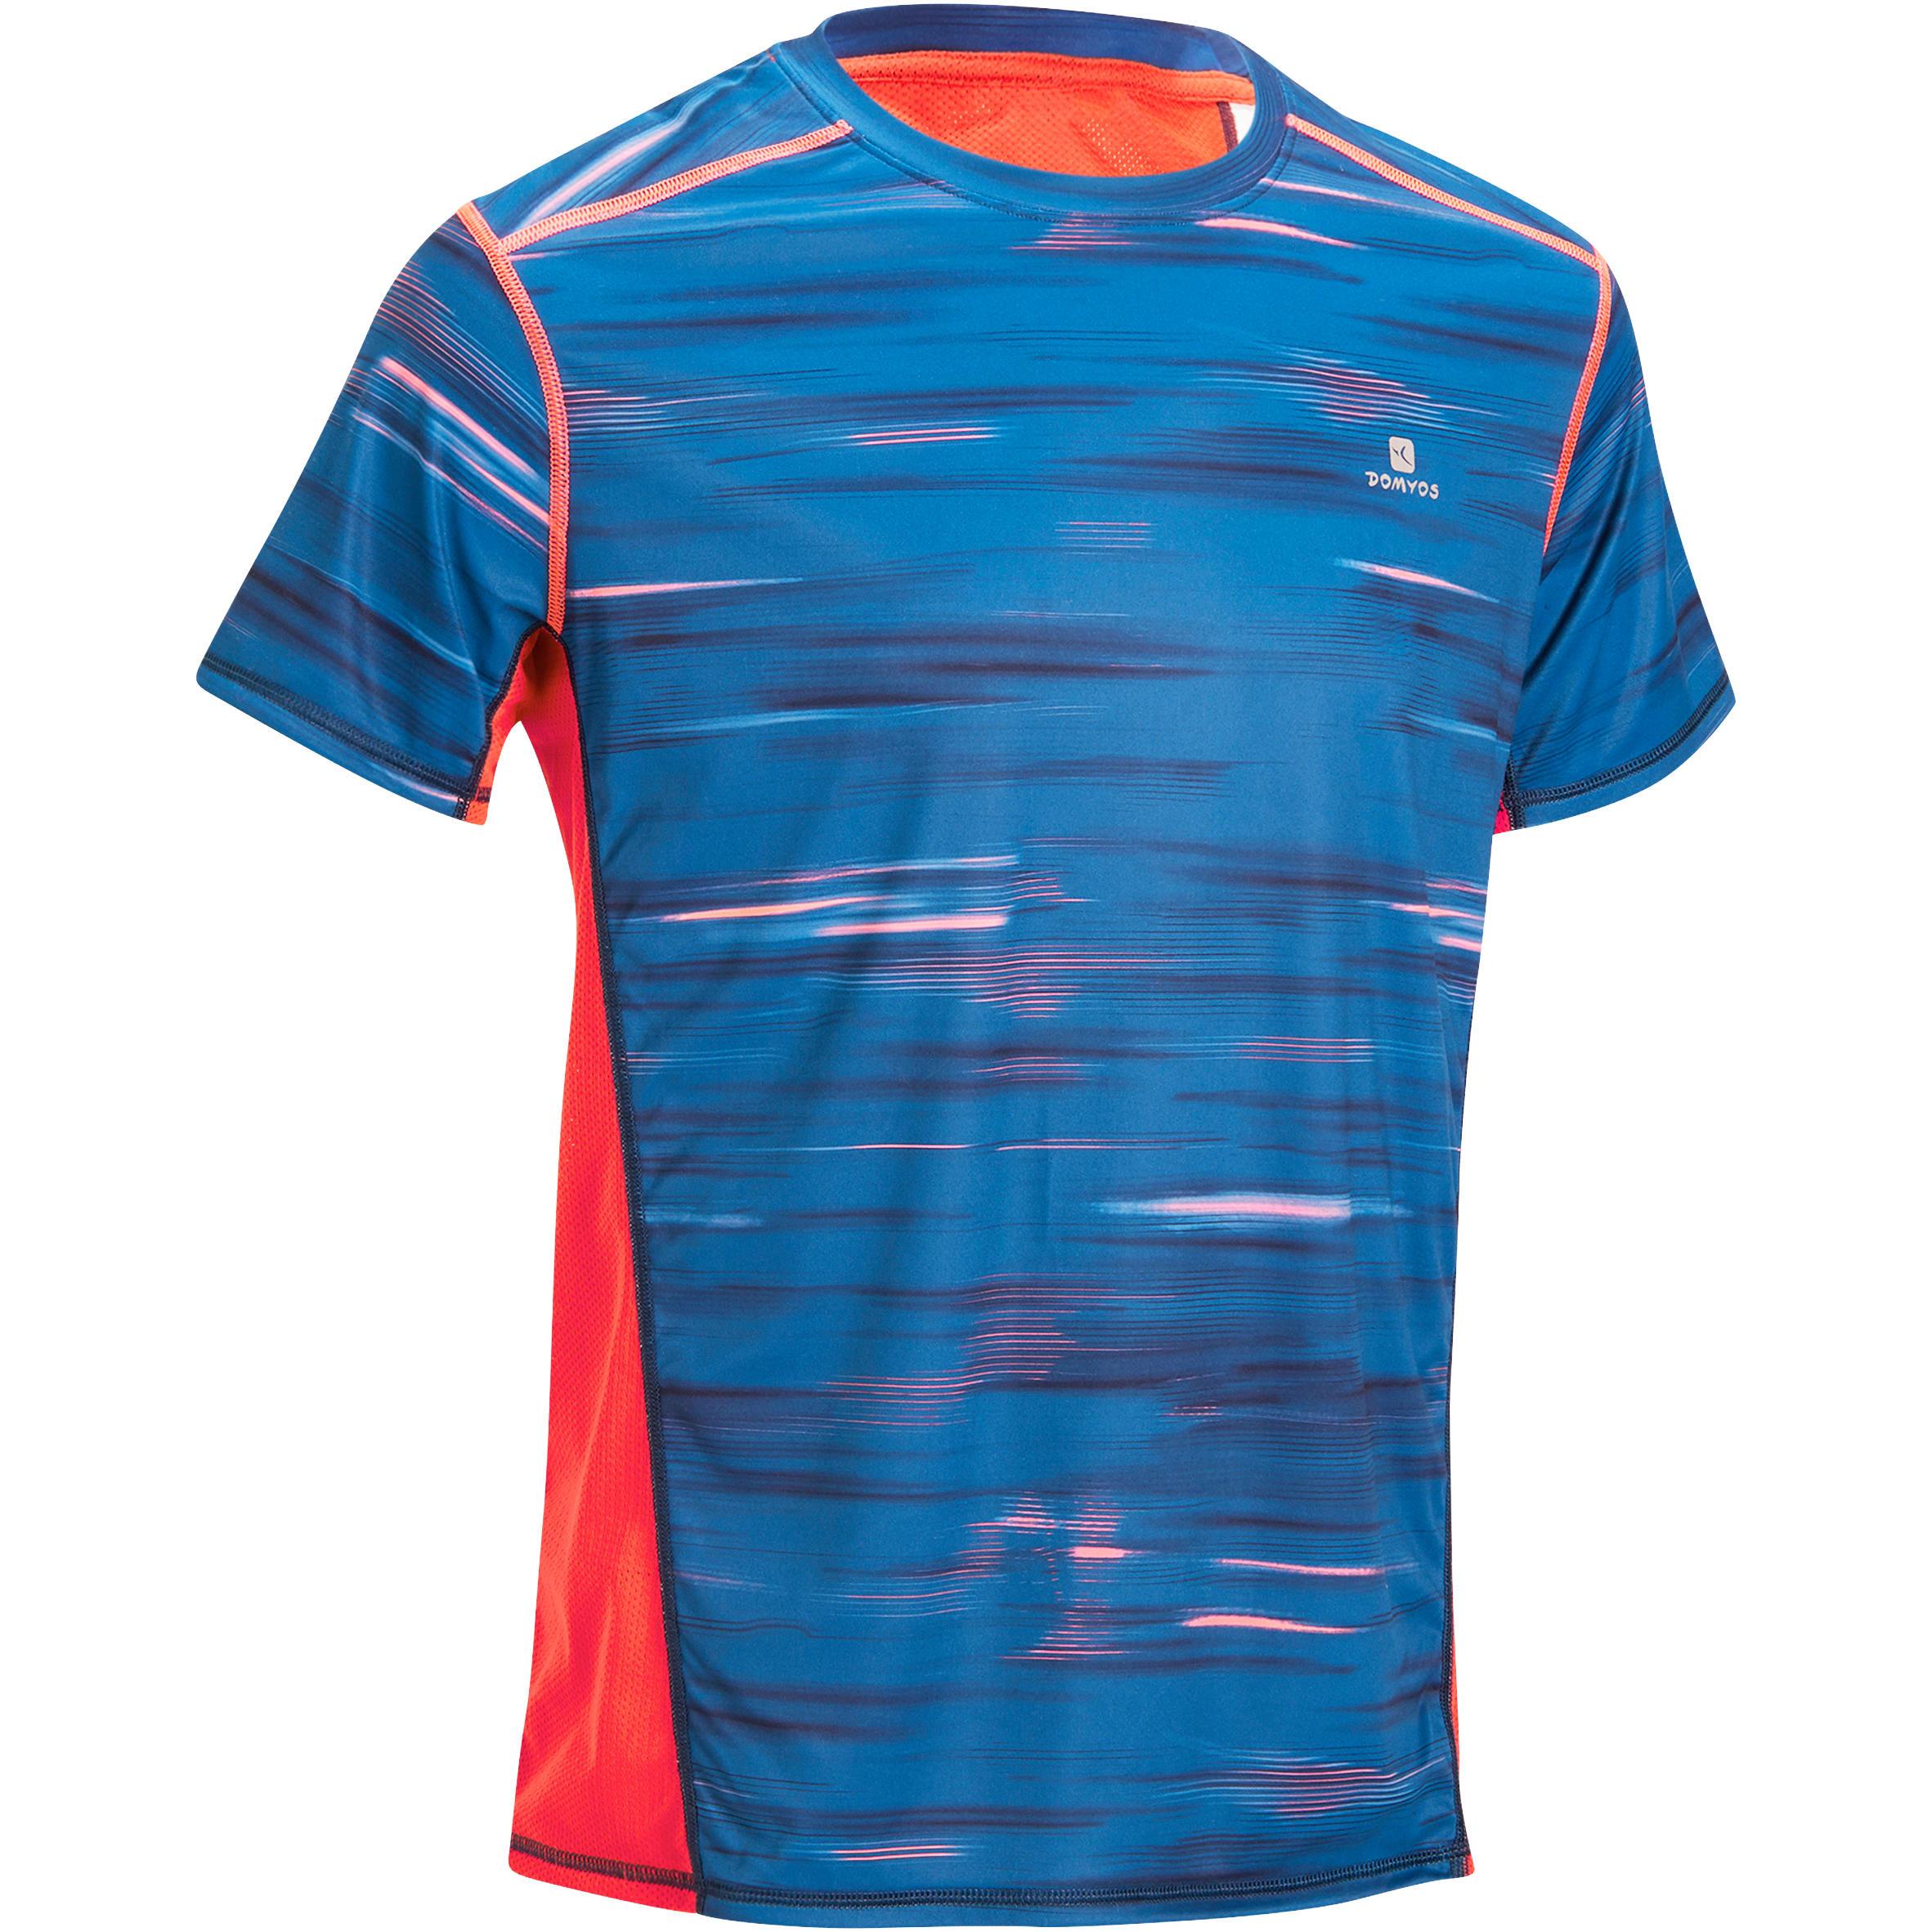 T Fitness Shirt Motifs Cardio Corail Energy Bleu Homme R5L4Aj